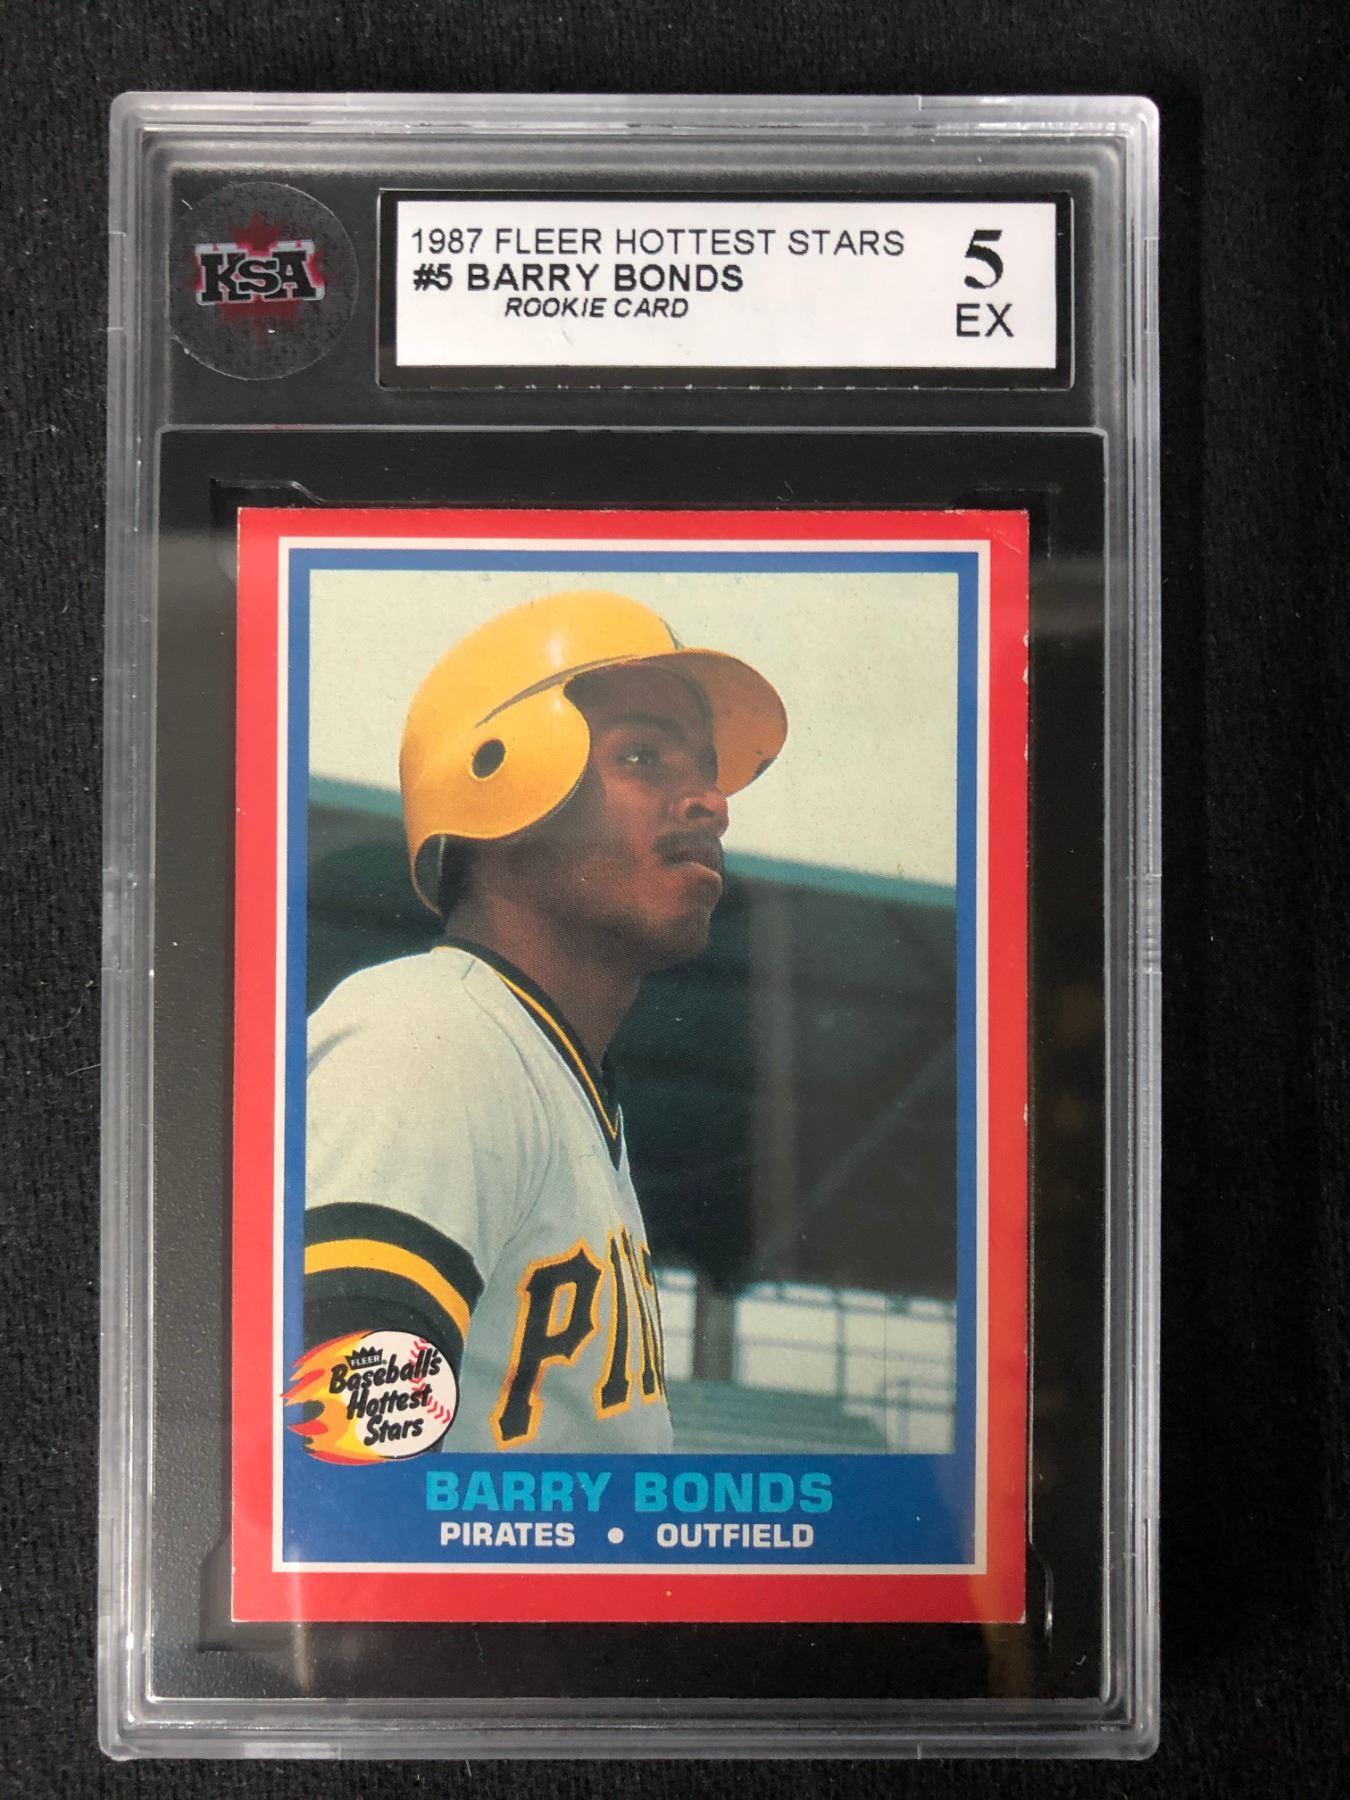 1987 Fleer Hottest Stars 5 Barry Bonds Rookie Card 5 Ex